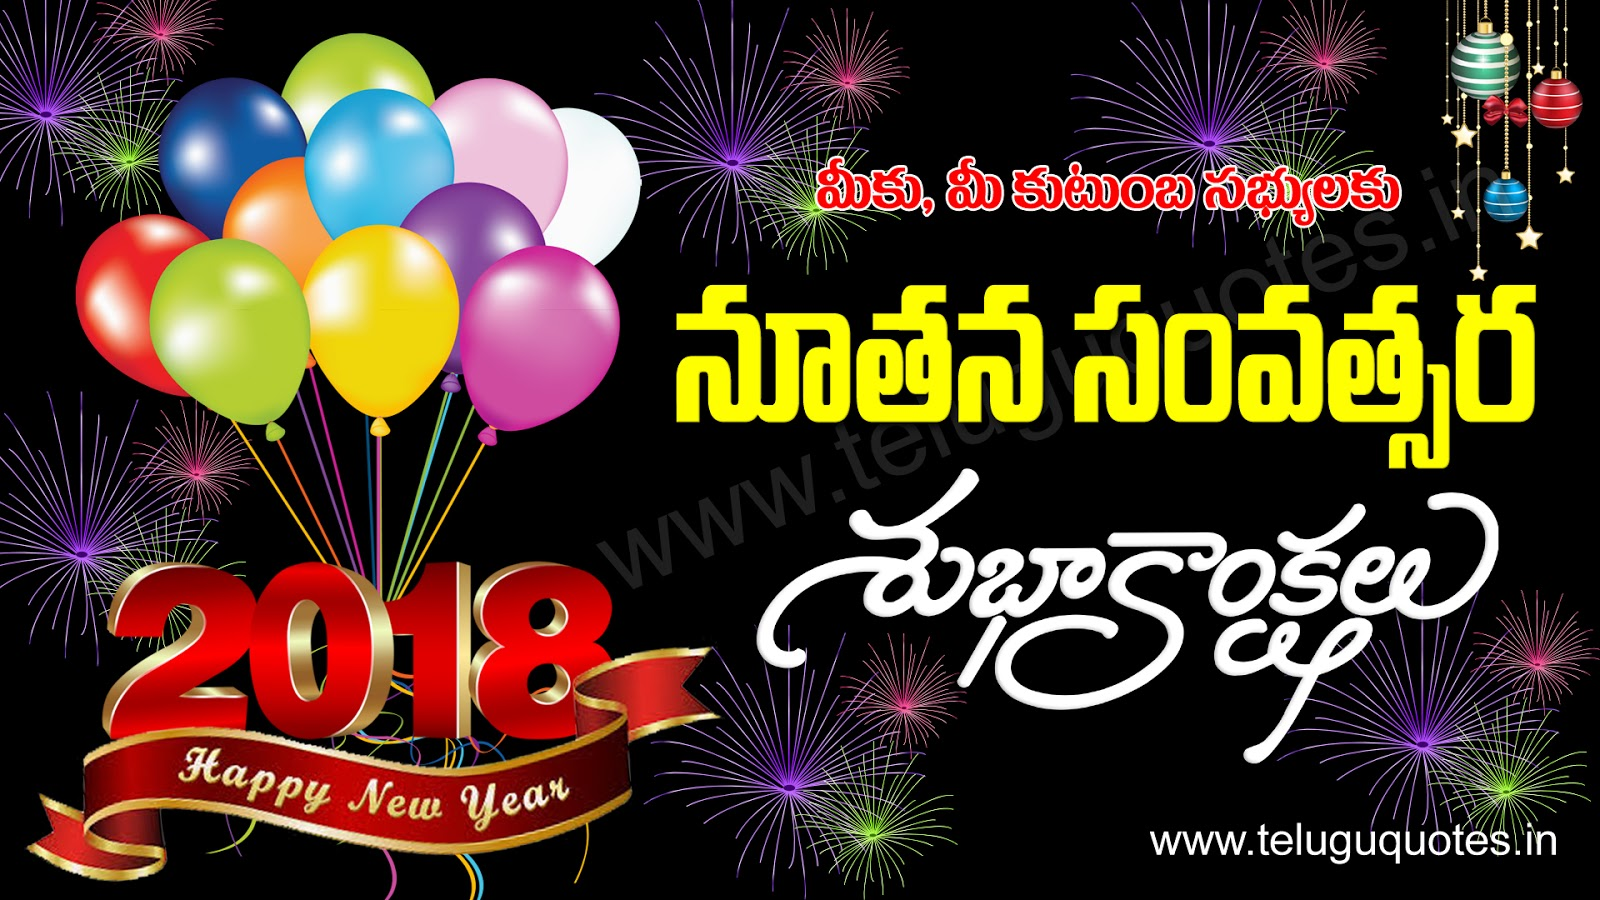 Happy New Year Quotes Images Telugu Quotes